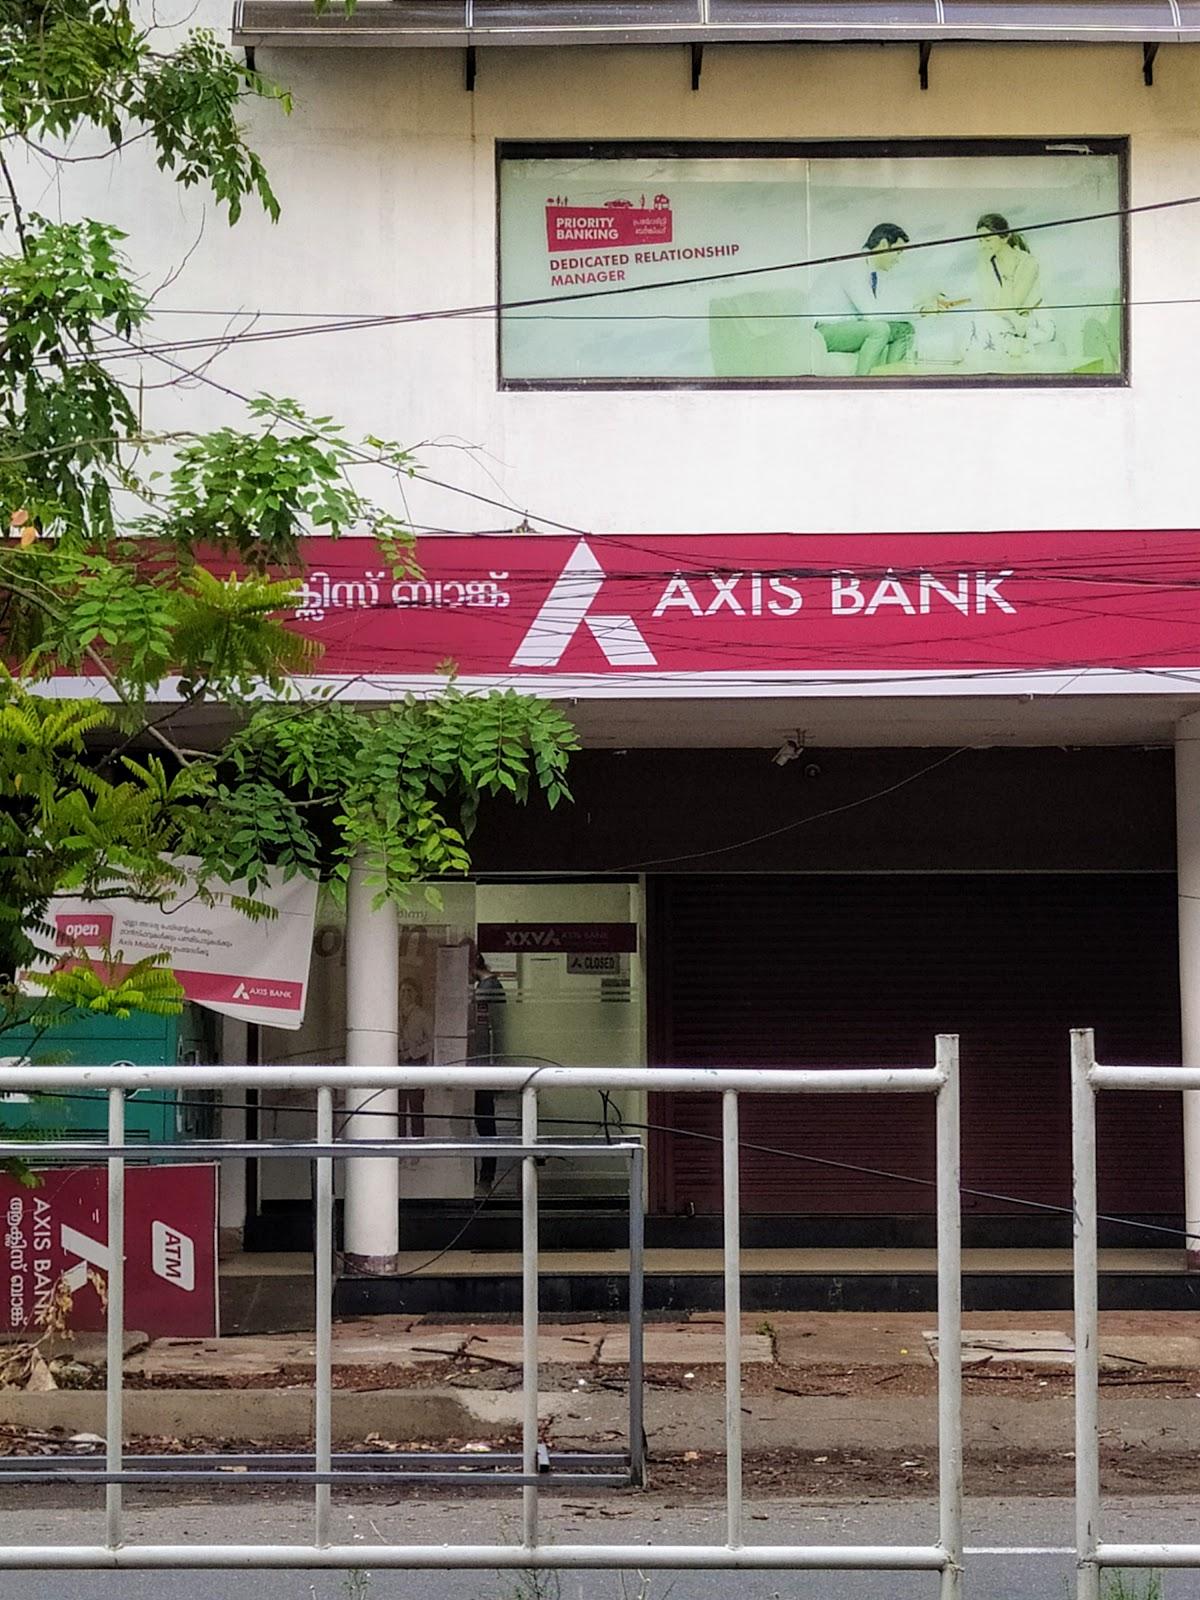 blood bank Axis Bank near Ernakulam Kerala